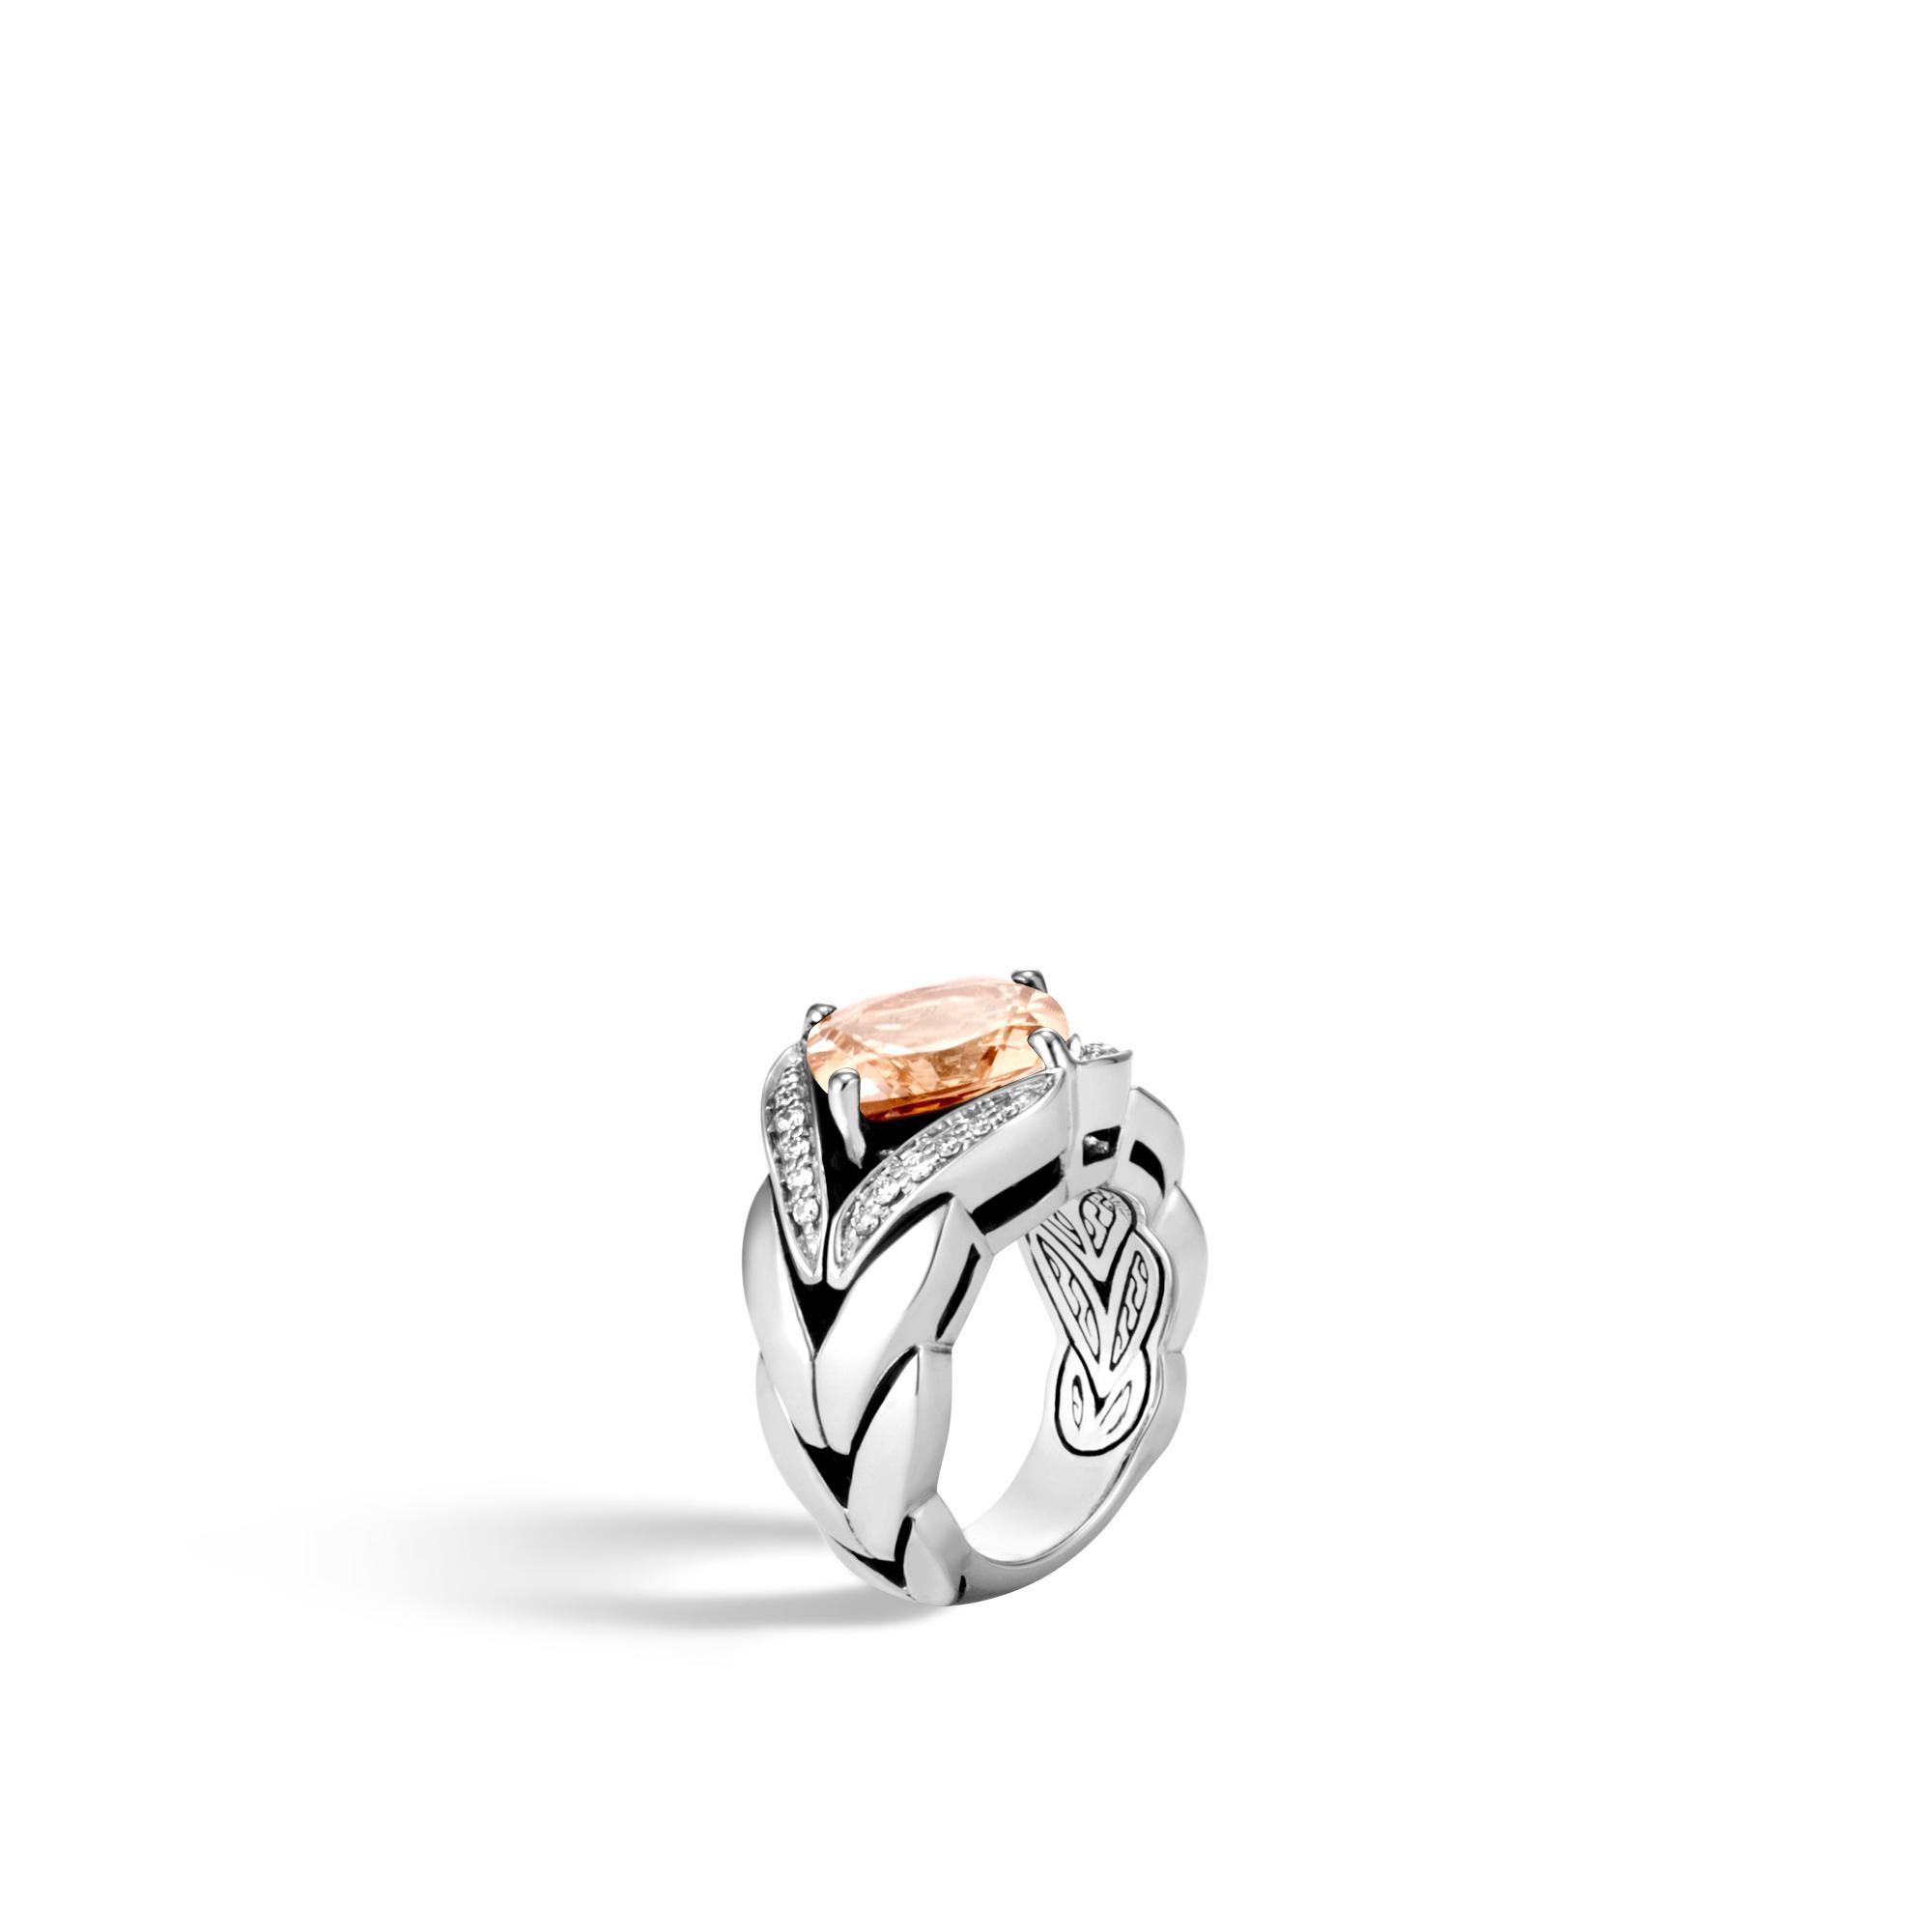 John Hardy Magic Cut Ring With Champagne Topaz And Diamonds ch6YsJ9f